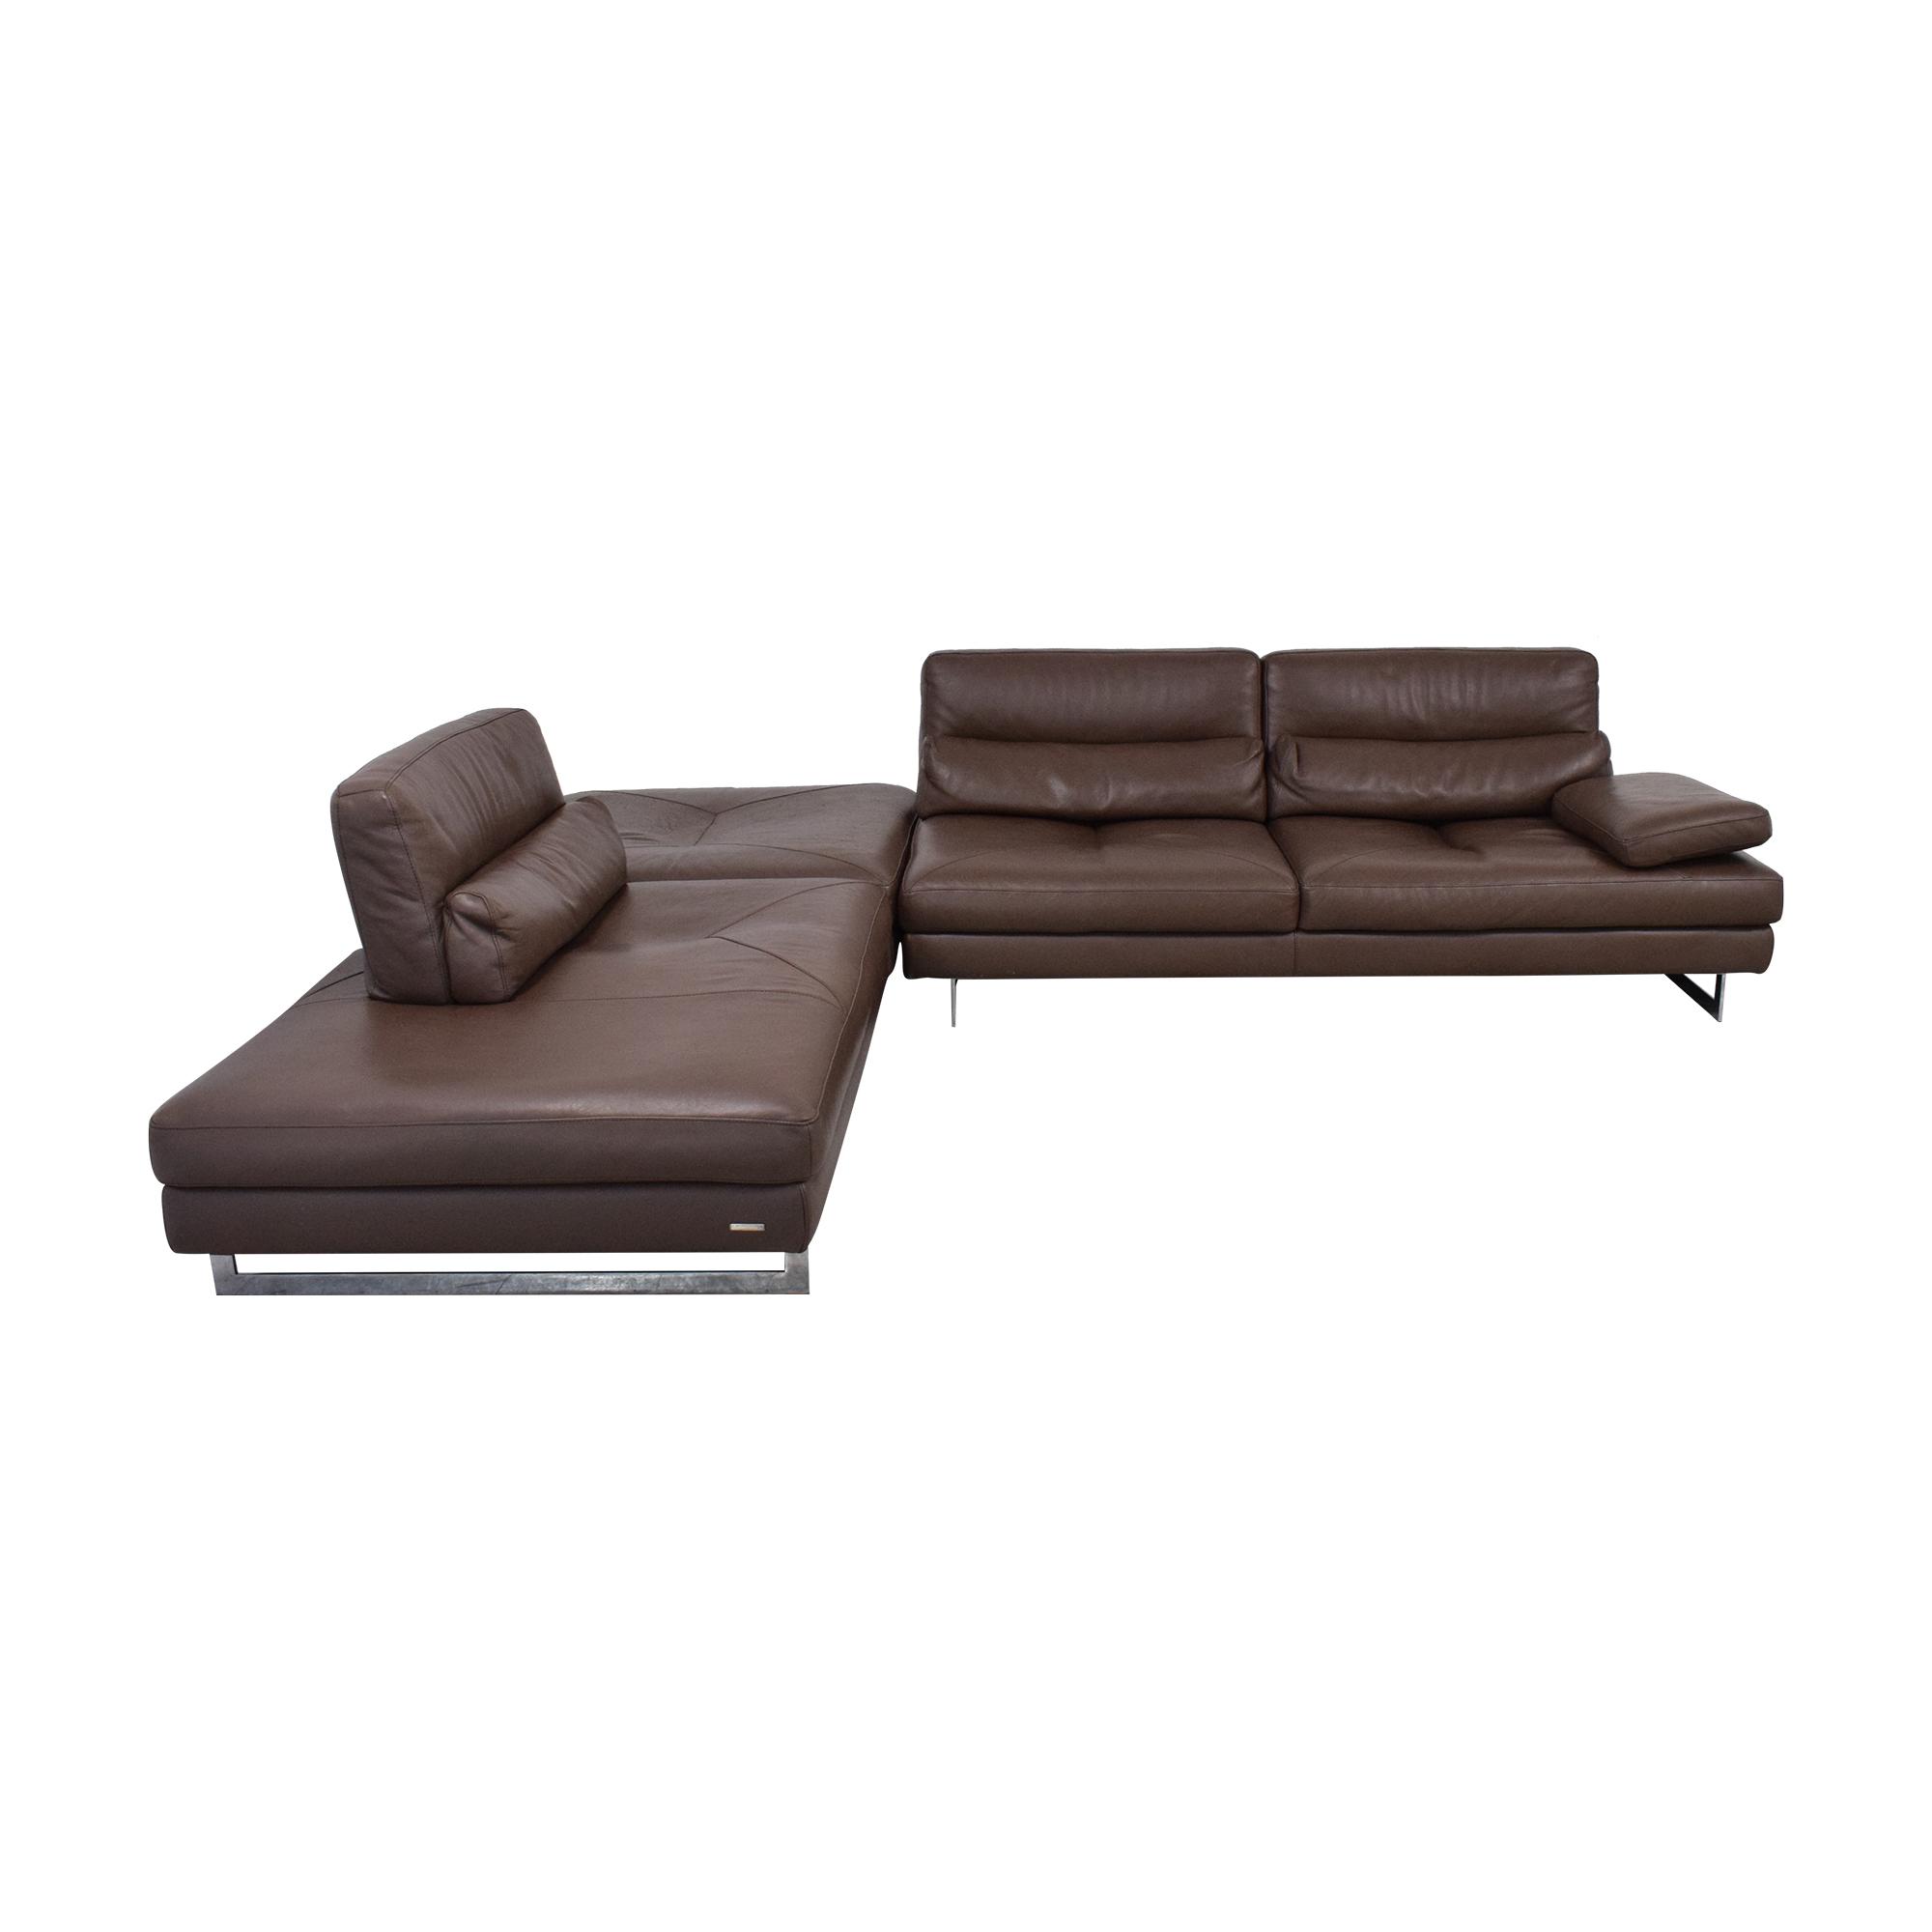 Roche Bobois Roche Bobois Scenario Chaise Sectional Sofa nyc